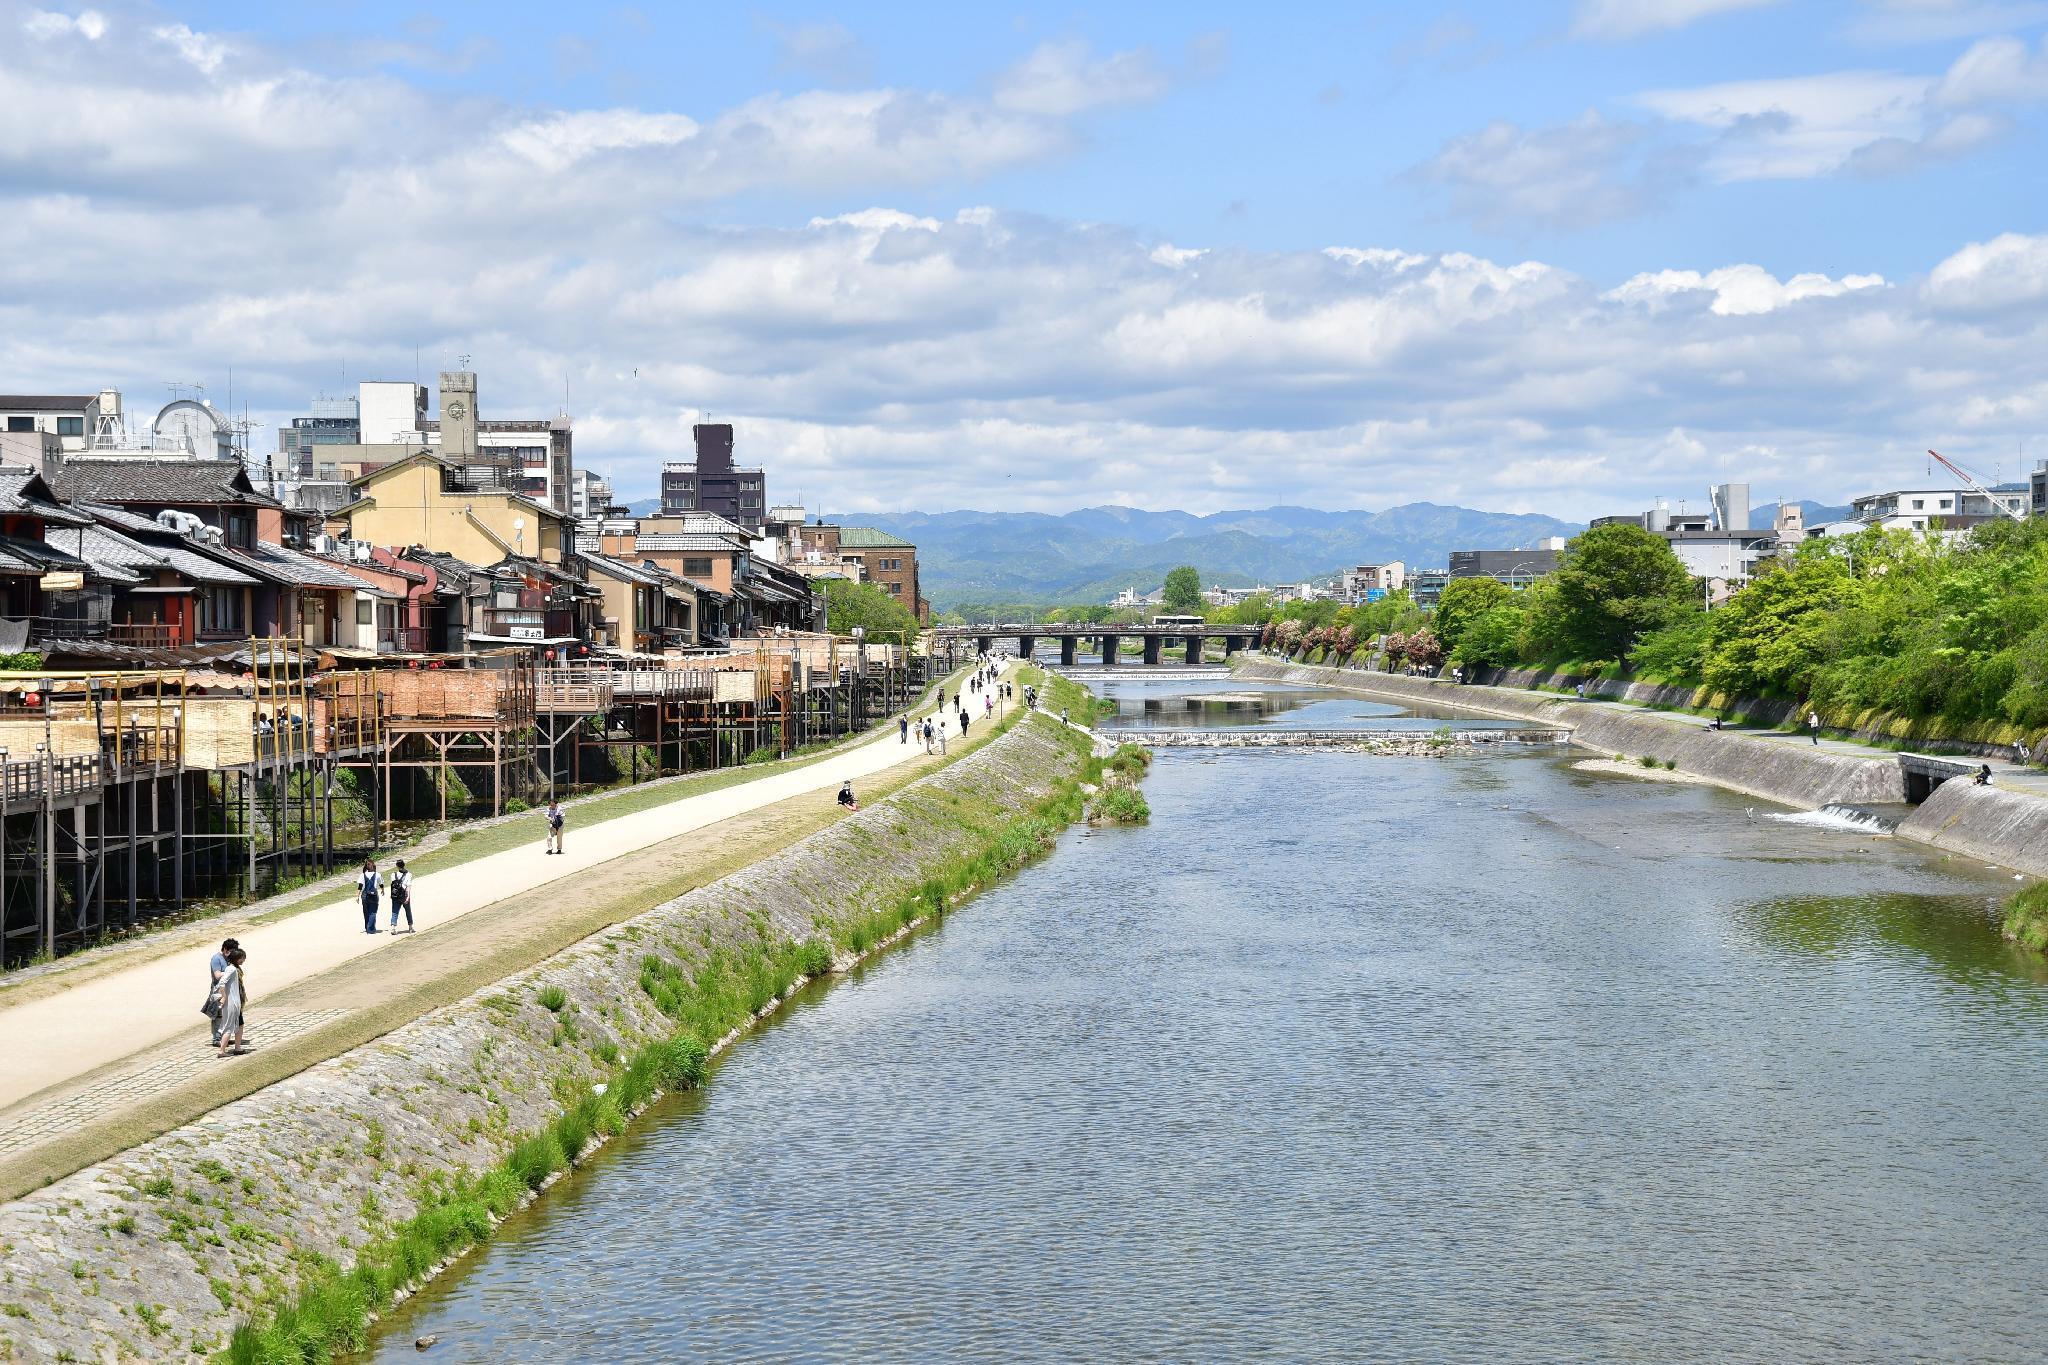 Holzbau Higashiyama